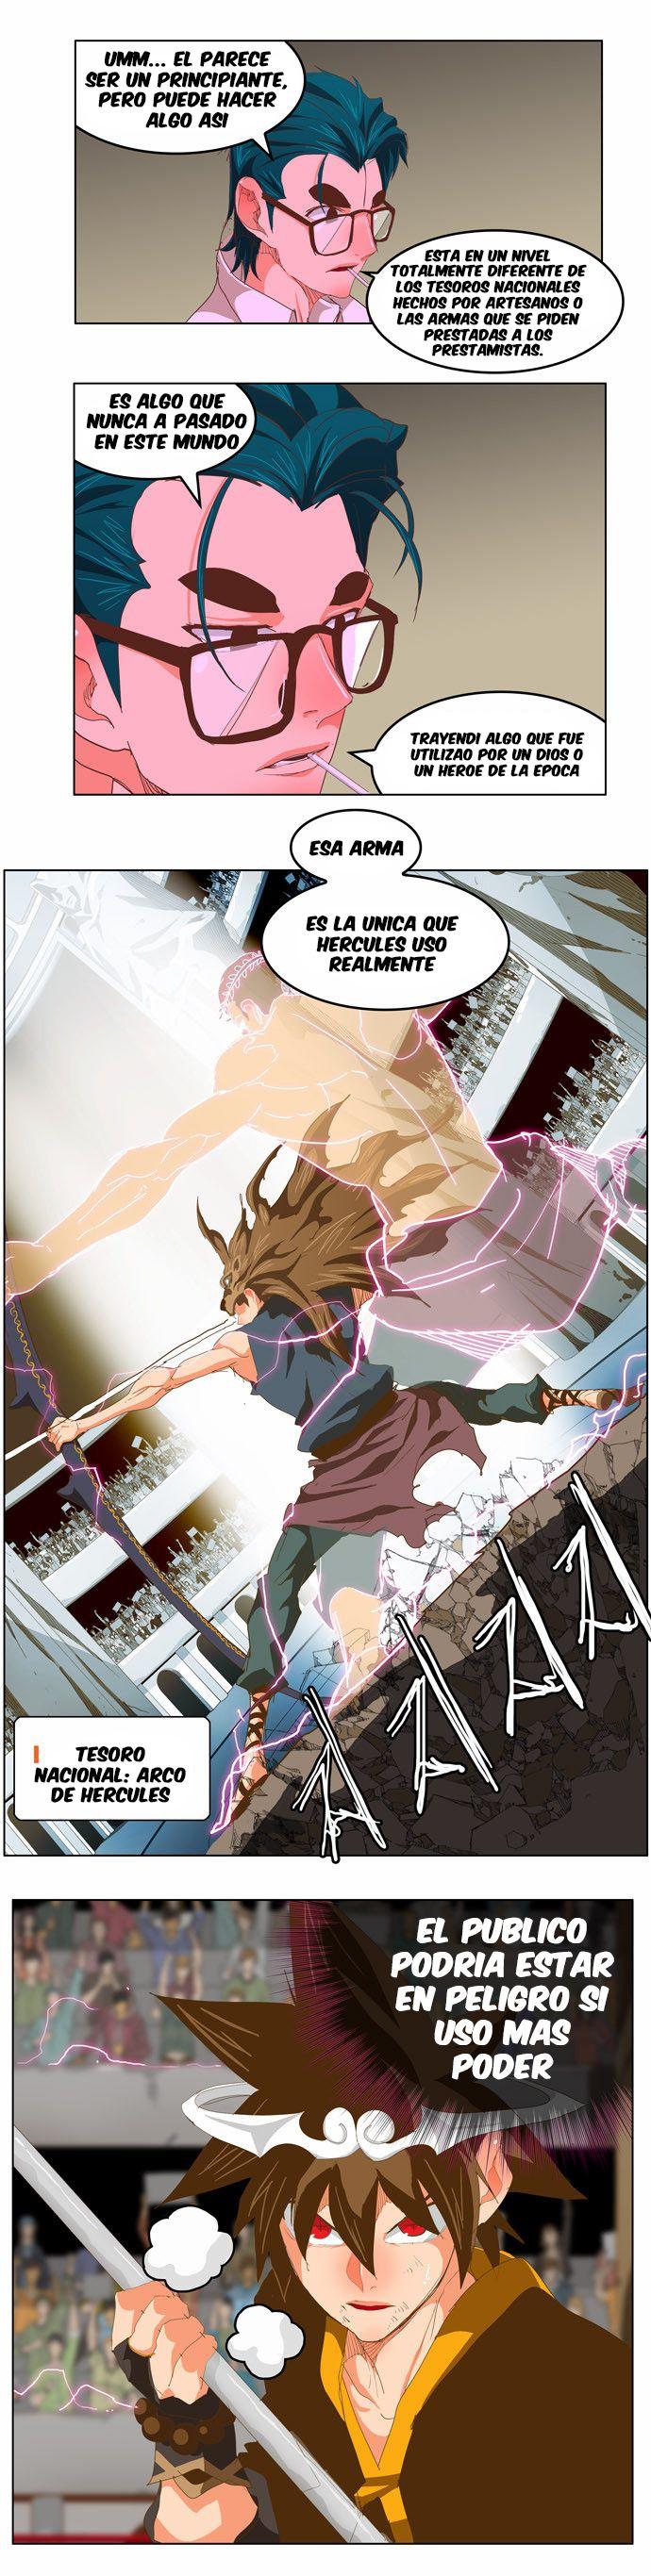 http://c5.ninemanga.com/es_manga/37/485/461431/d8537cb044a115ac9bb9aaac726e0690.jpg Page 3